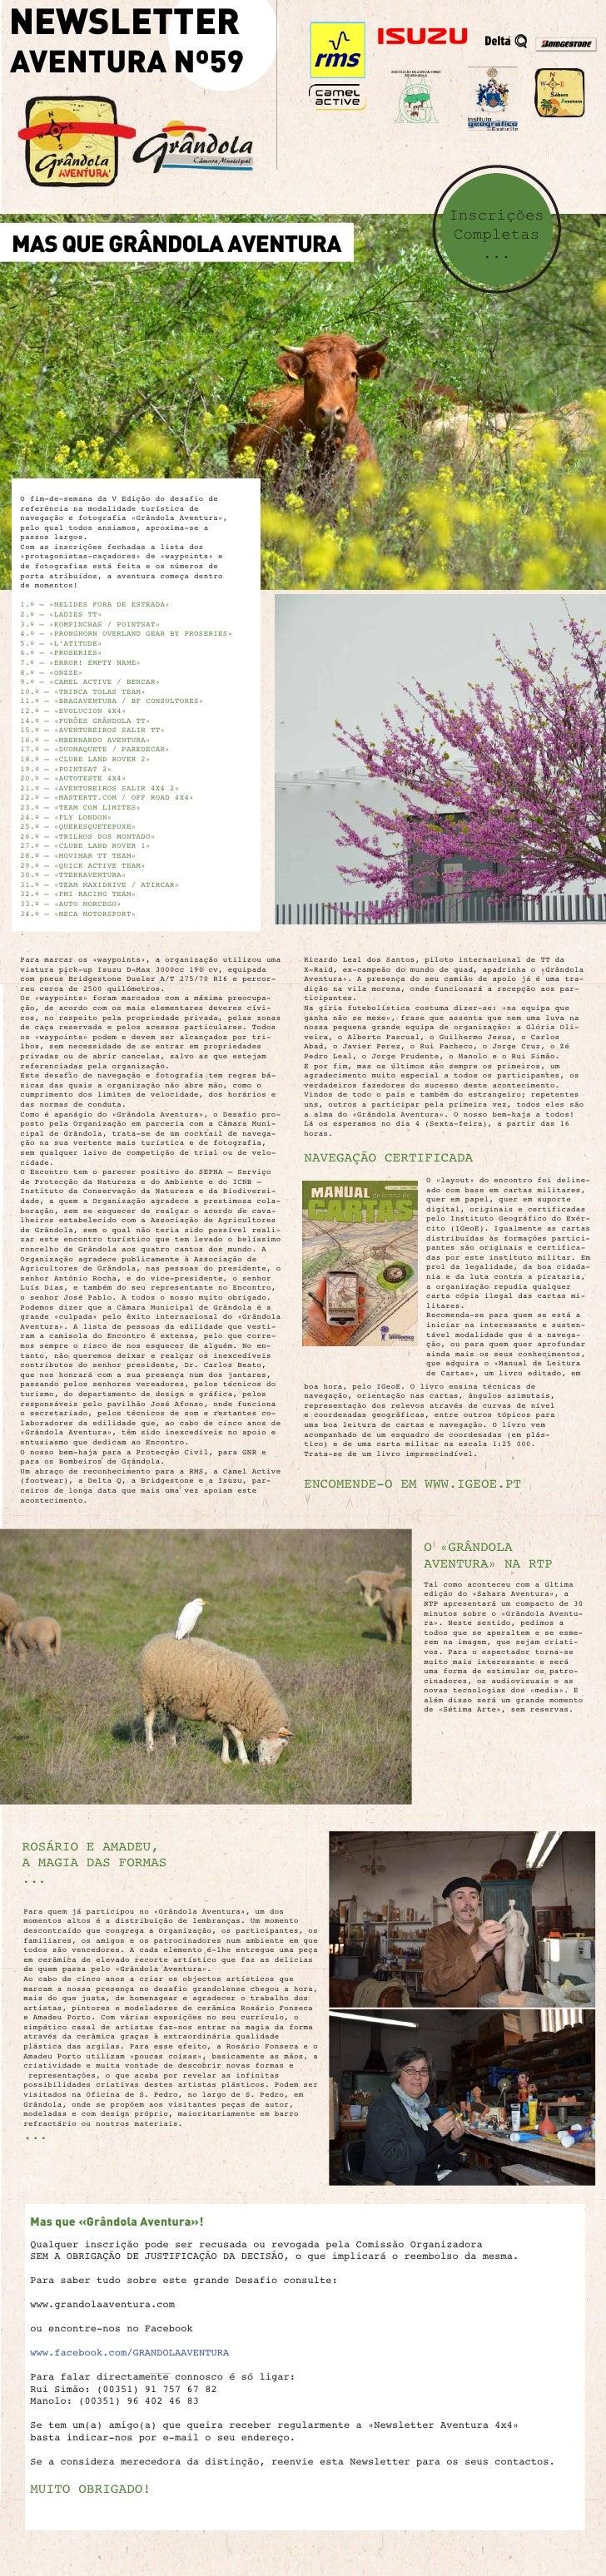 NEWSLETTERAVENTURA Nº59                                                                                        Inscrições ...